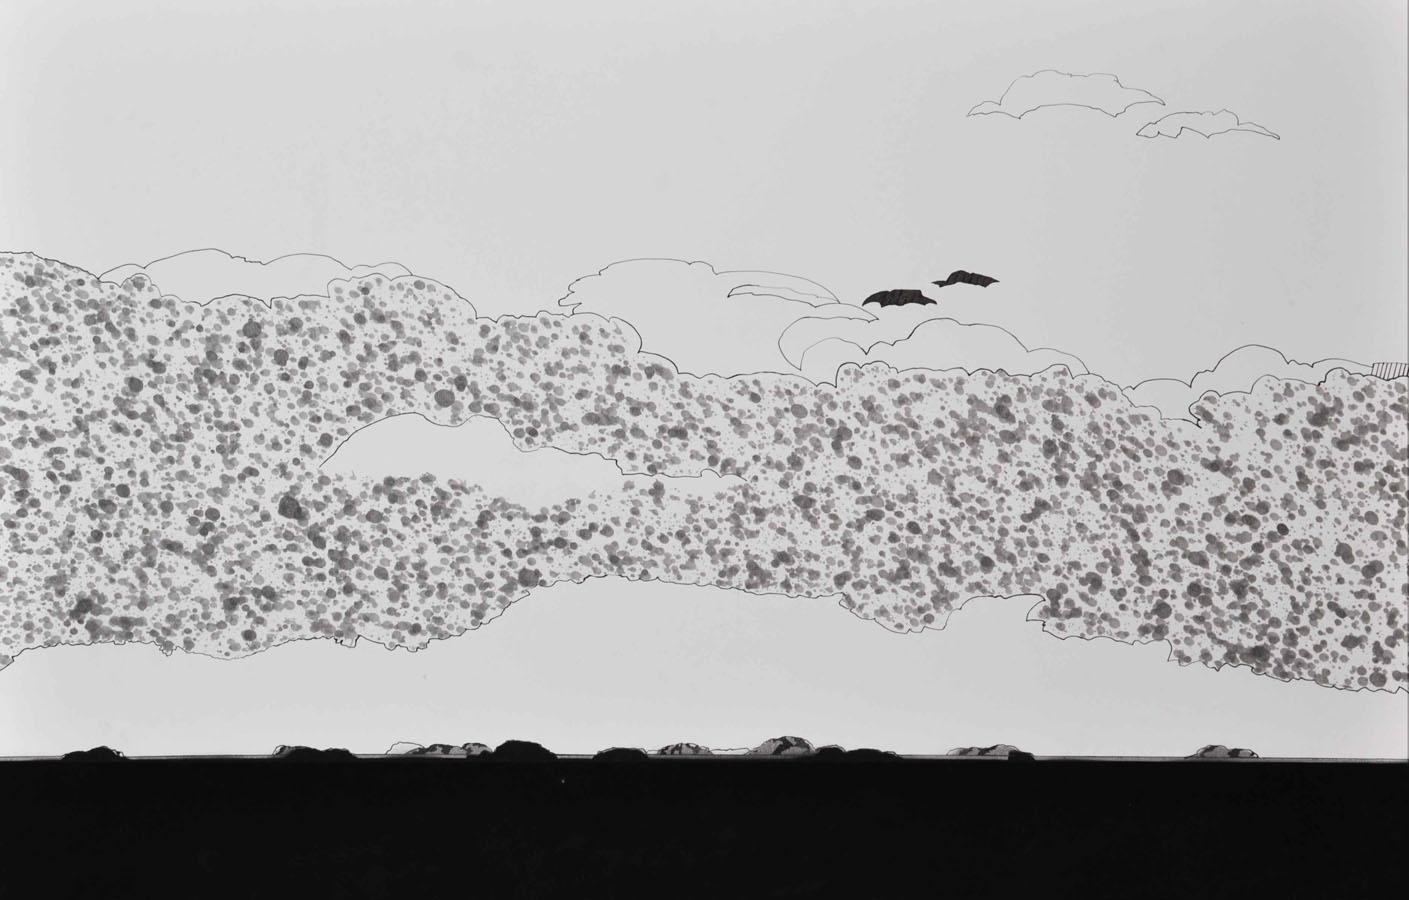 V.F. 1997. 60 x 90. Paper, inc, acrylic, blacklacquer.